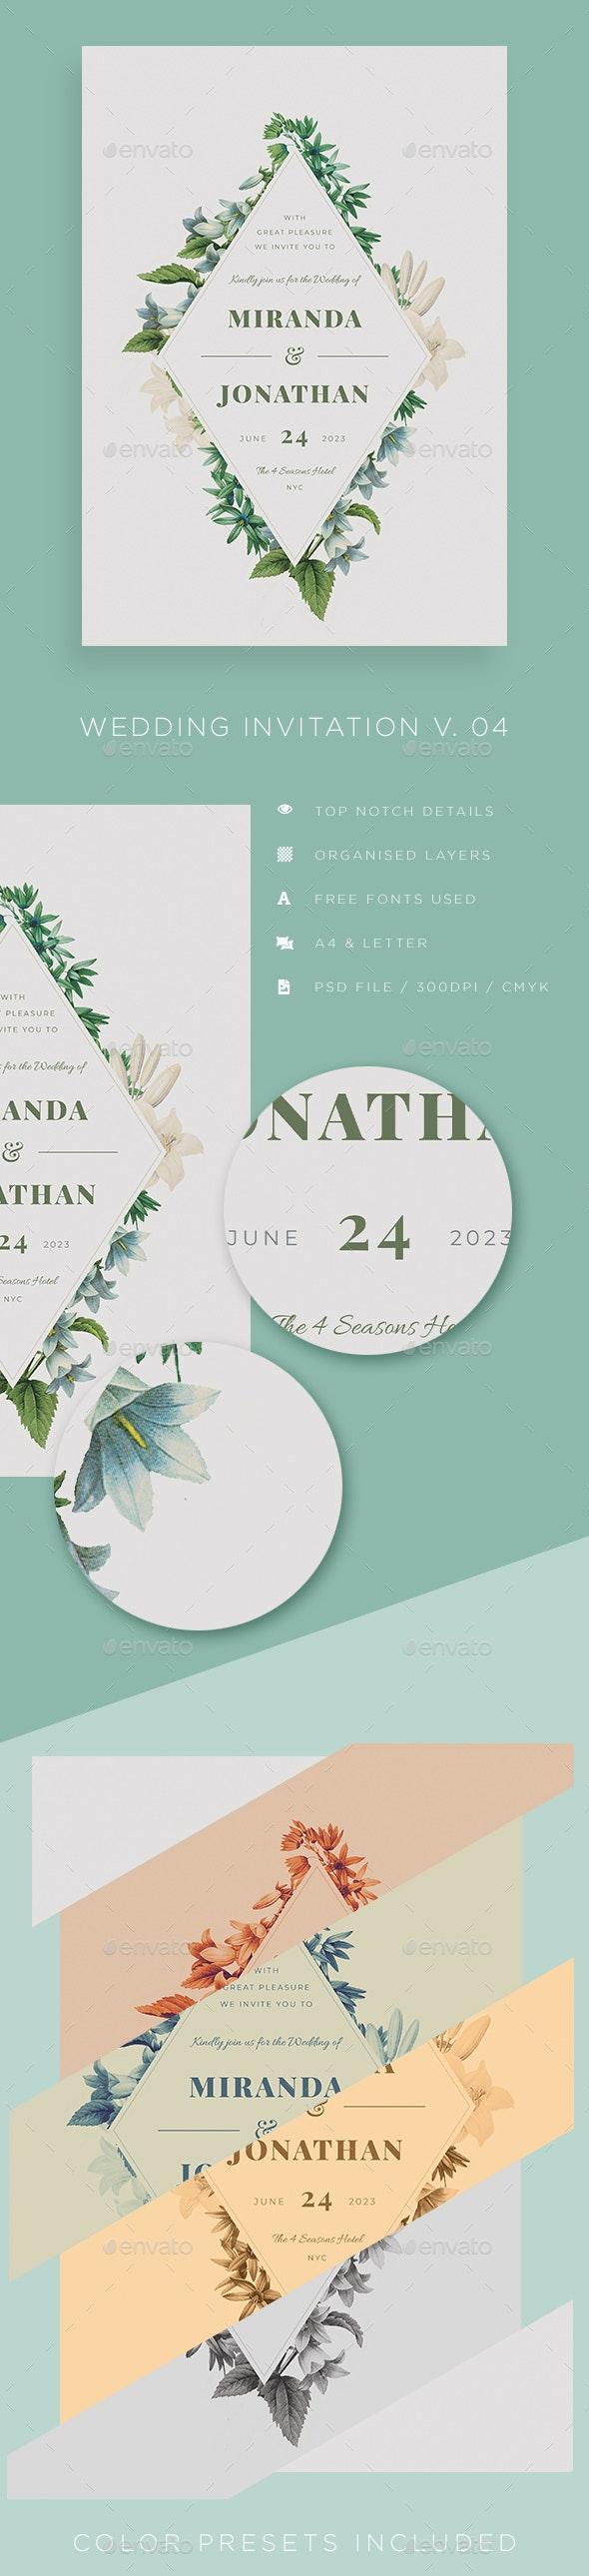 Wedding Invitation V04 - Weddings Cards & Invites